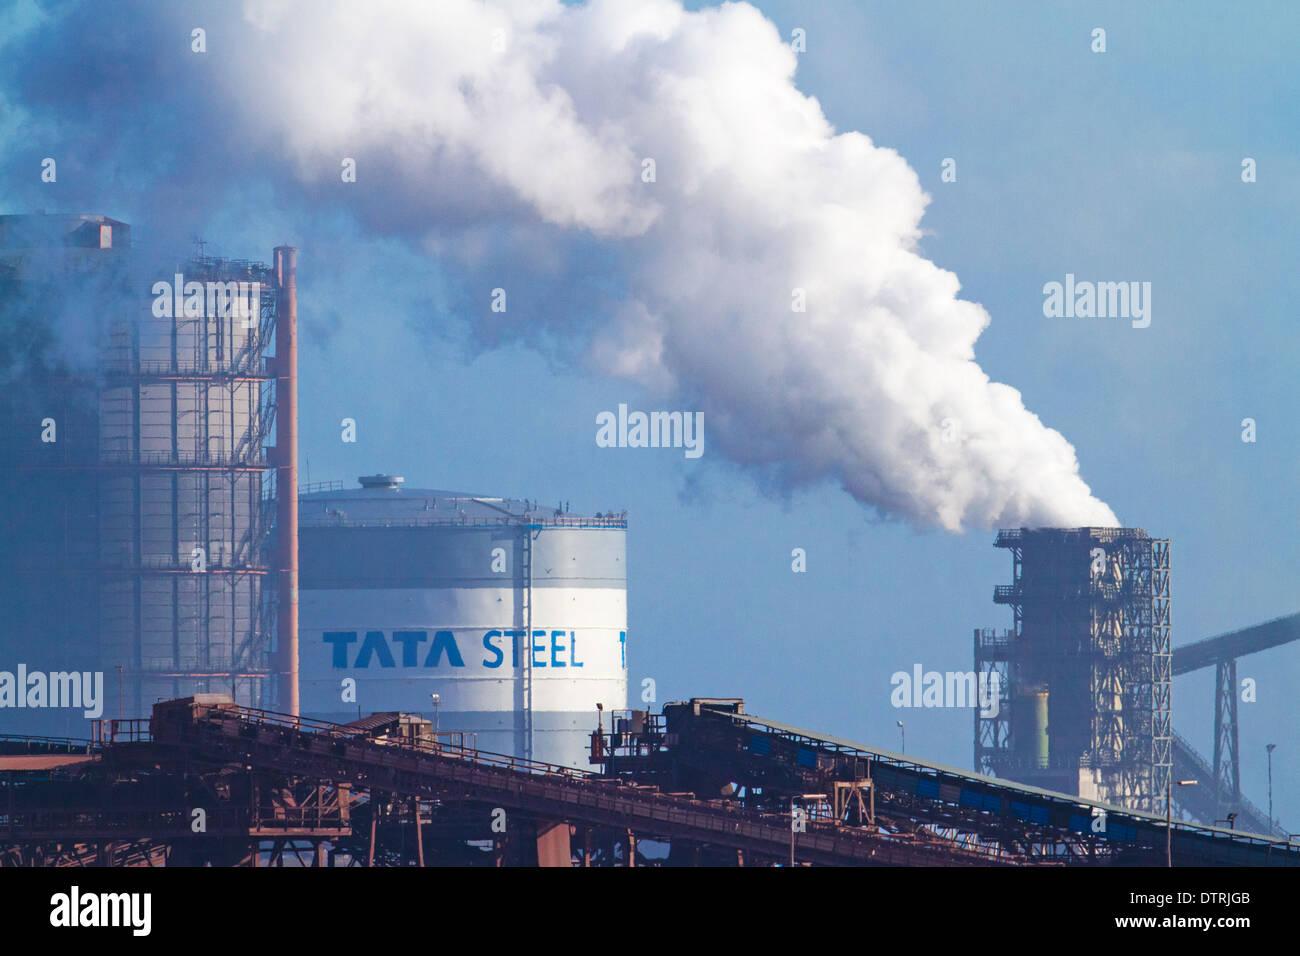 Tata steel, steelworks, Port Talbot, Neath, Wales - Stock Image